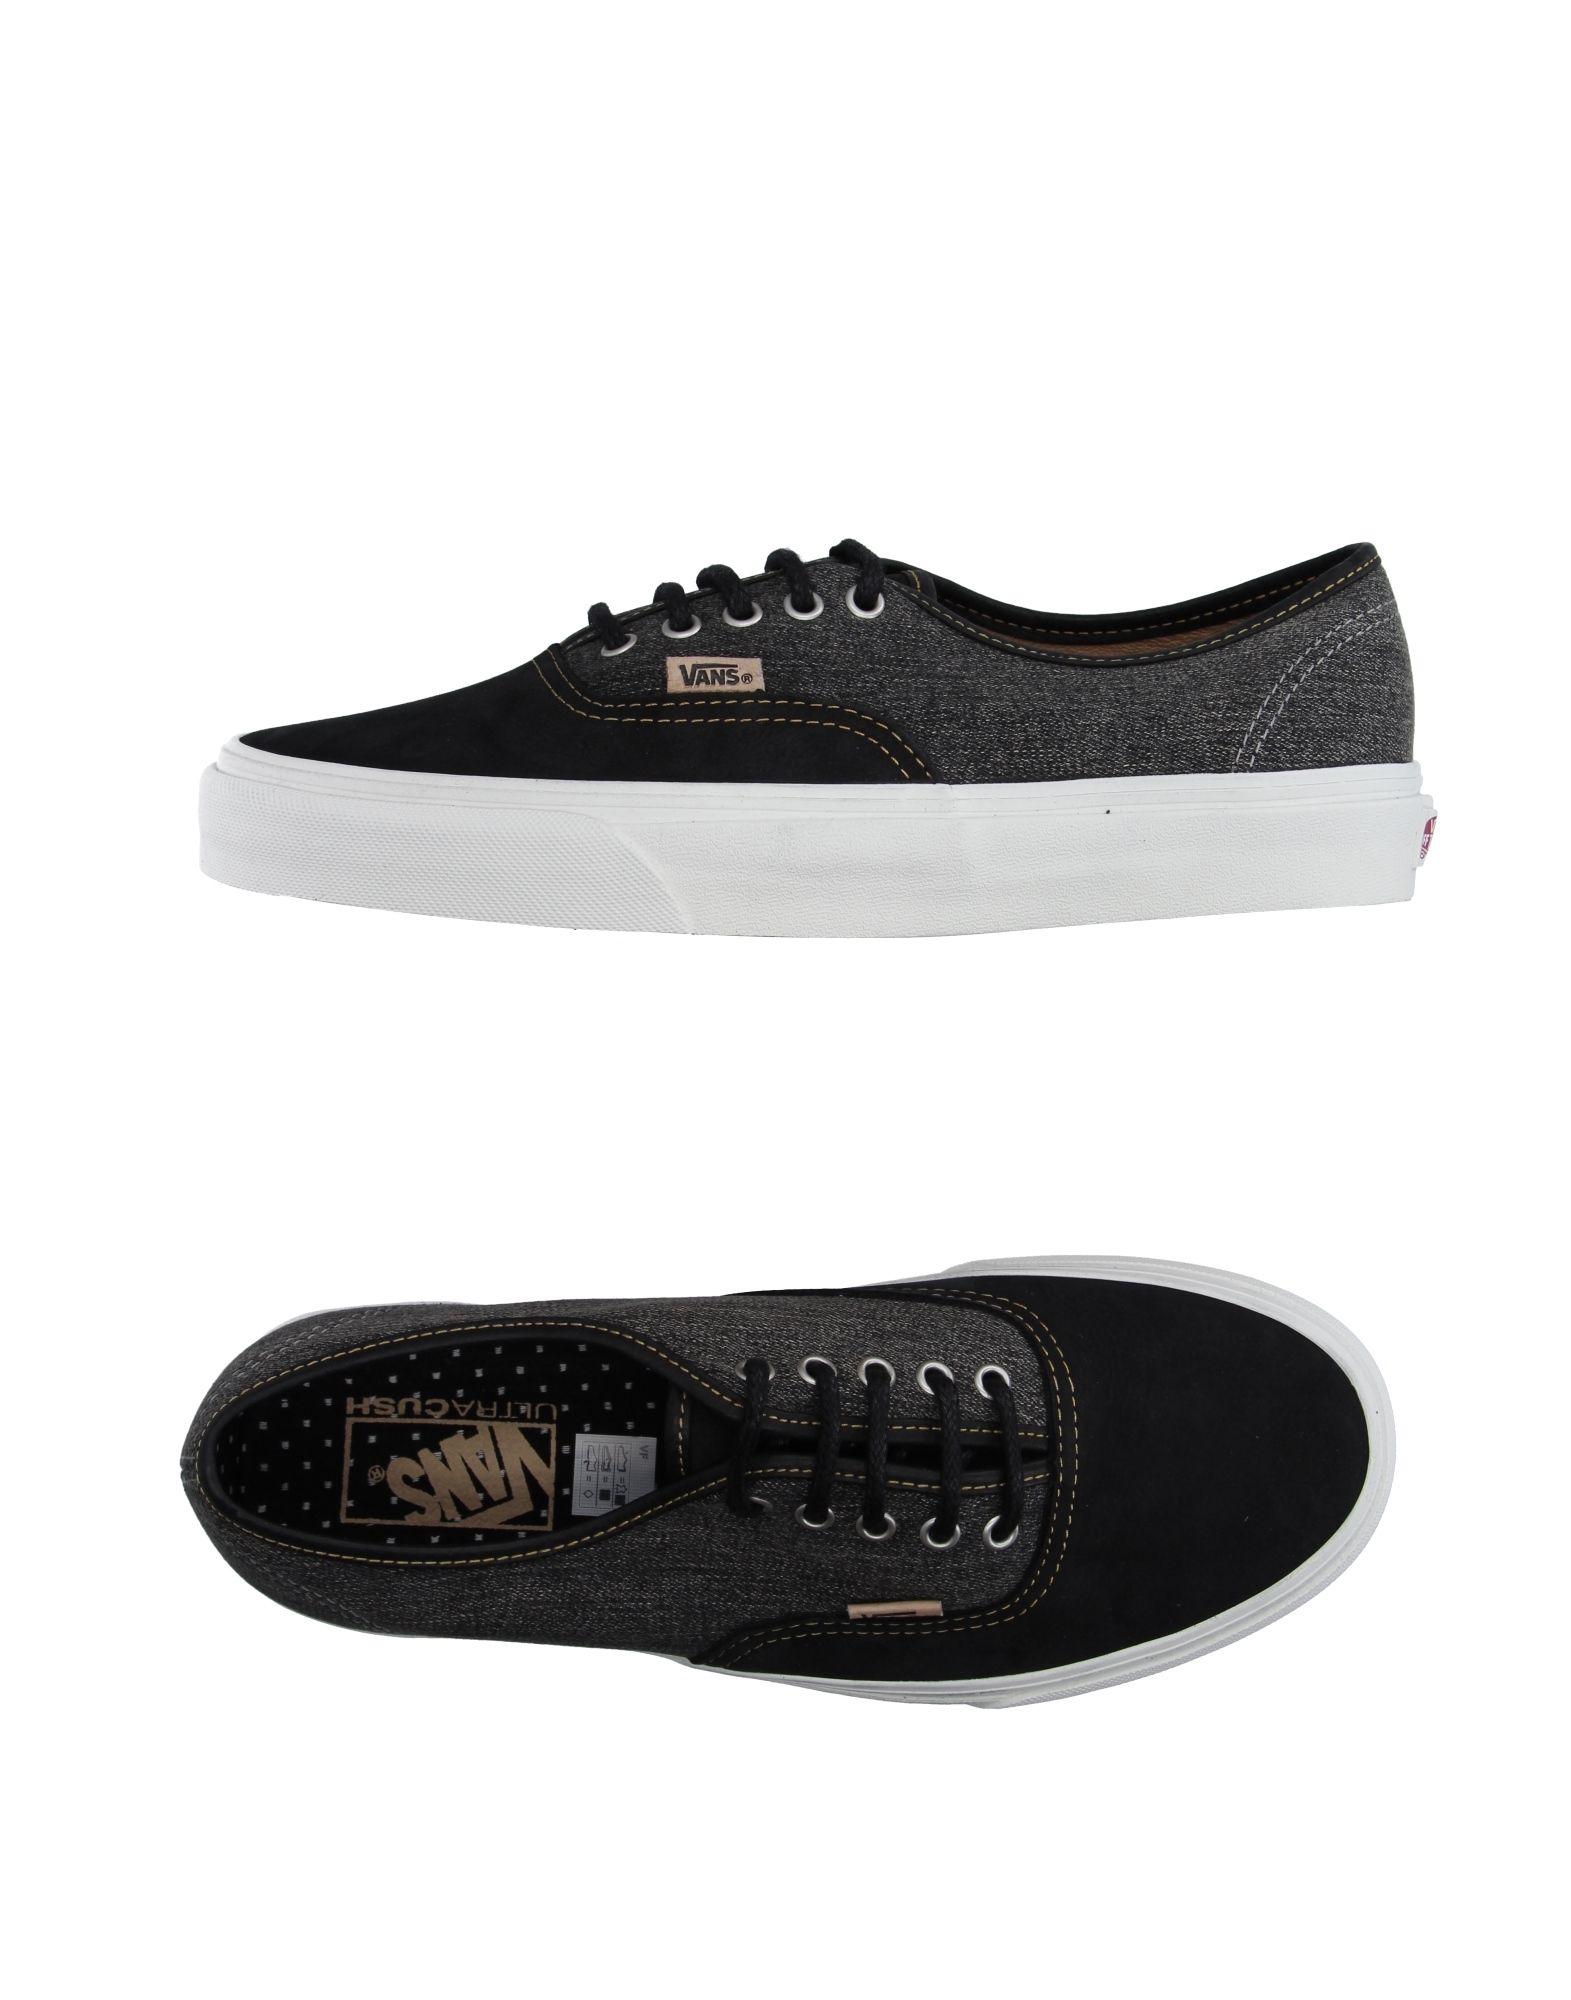 Vans Sneakers Heiße Herren  11109955VM Heiße Sneakers Schuhe 71a413